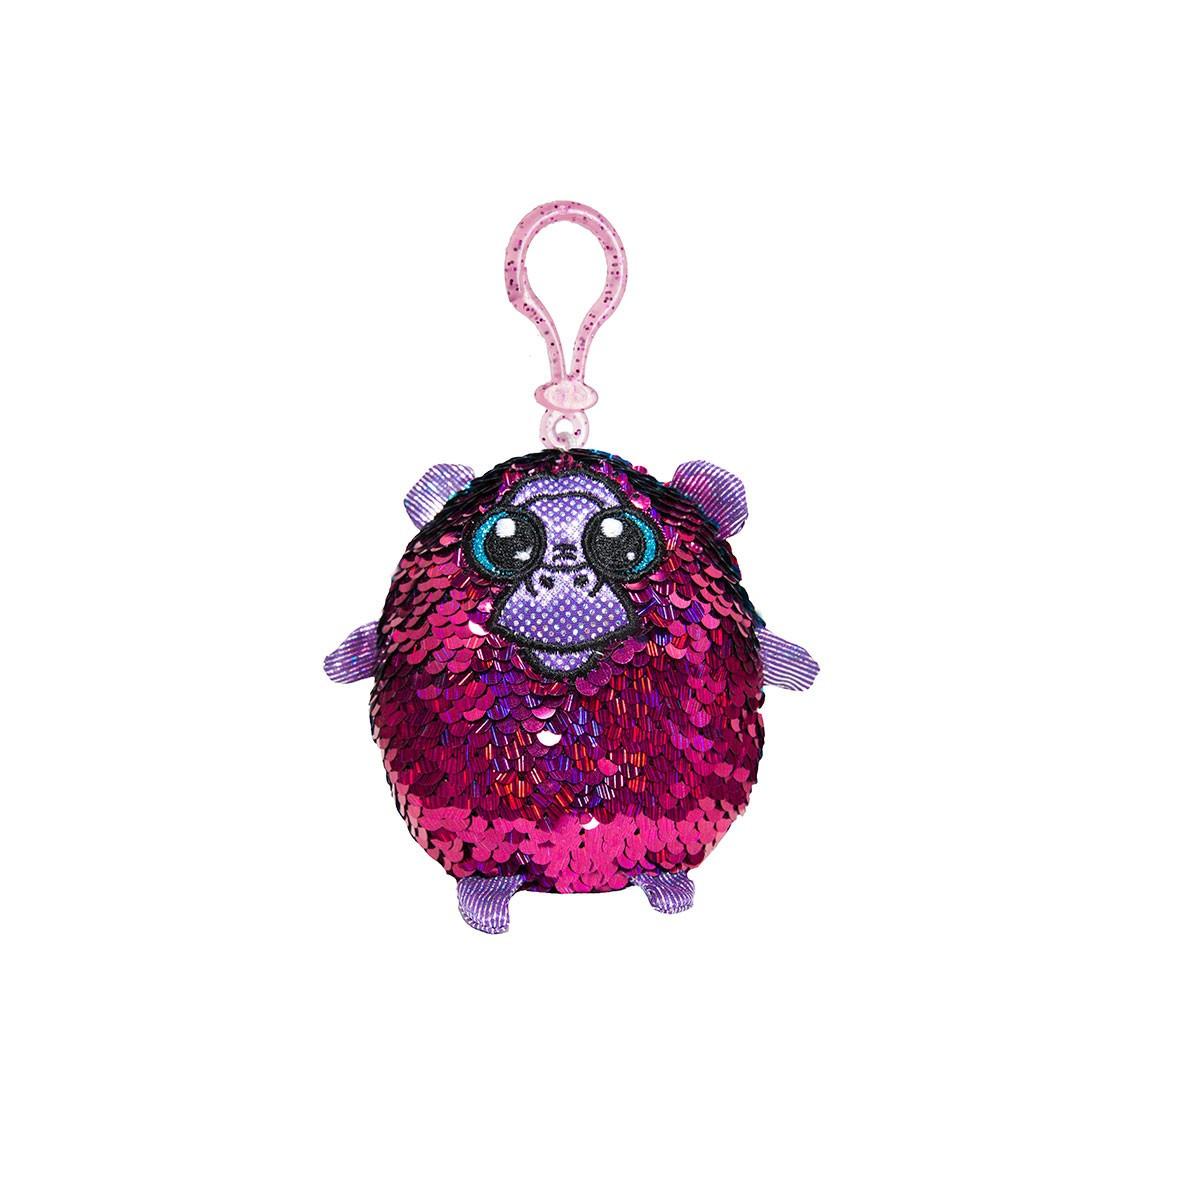 М'яка Іграшка з паєтками Shimmeez S2 - Хороша Мавпочка (9 см, на клипсі)